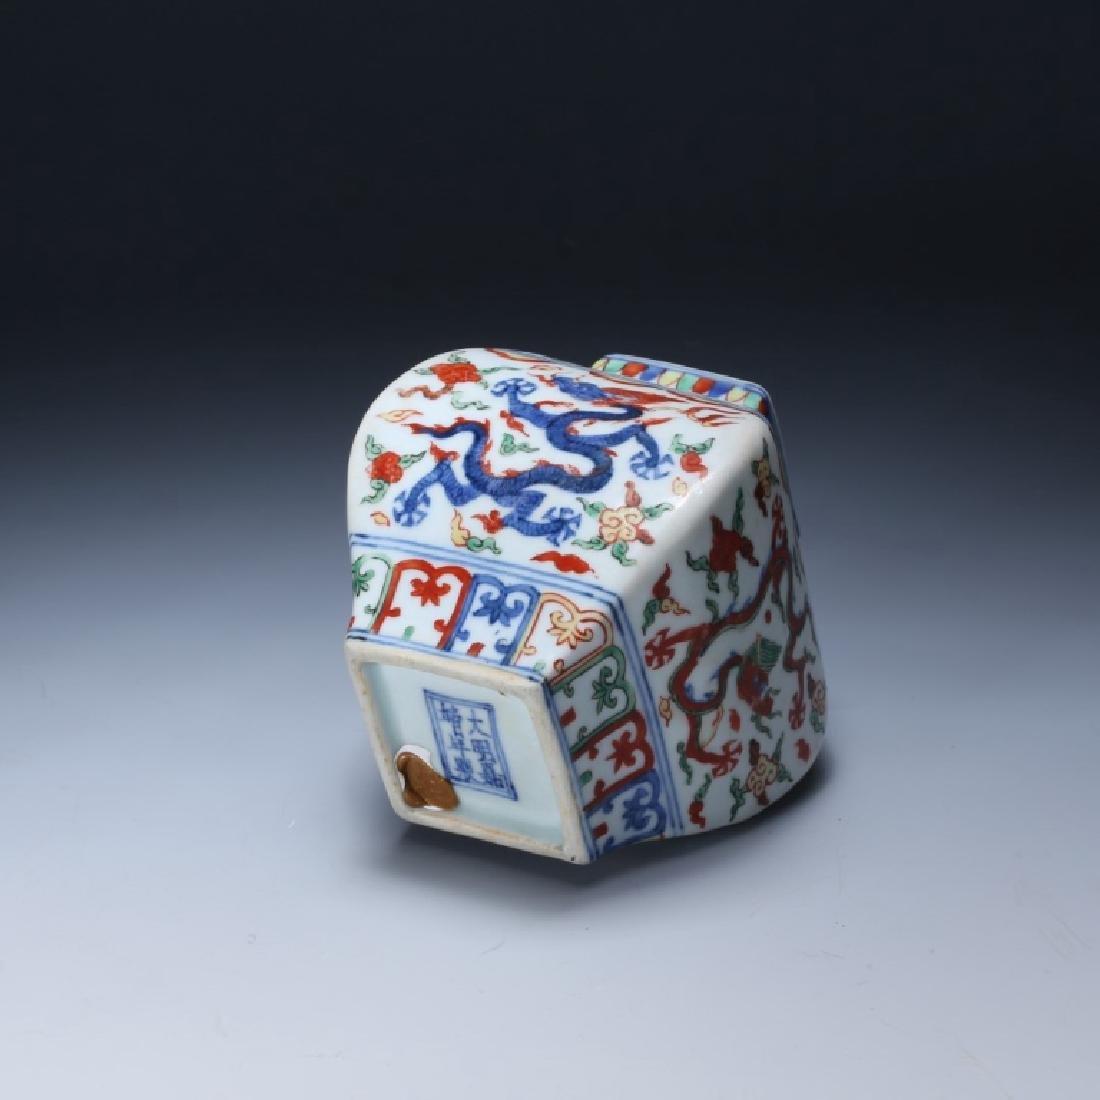 Chinese Qing Dynasty Wucai Porcelain Jar - 7